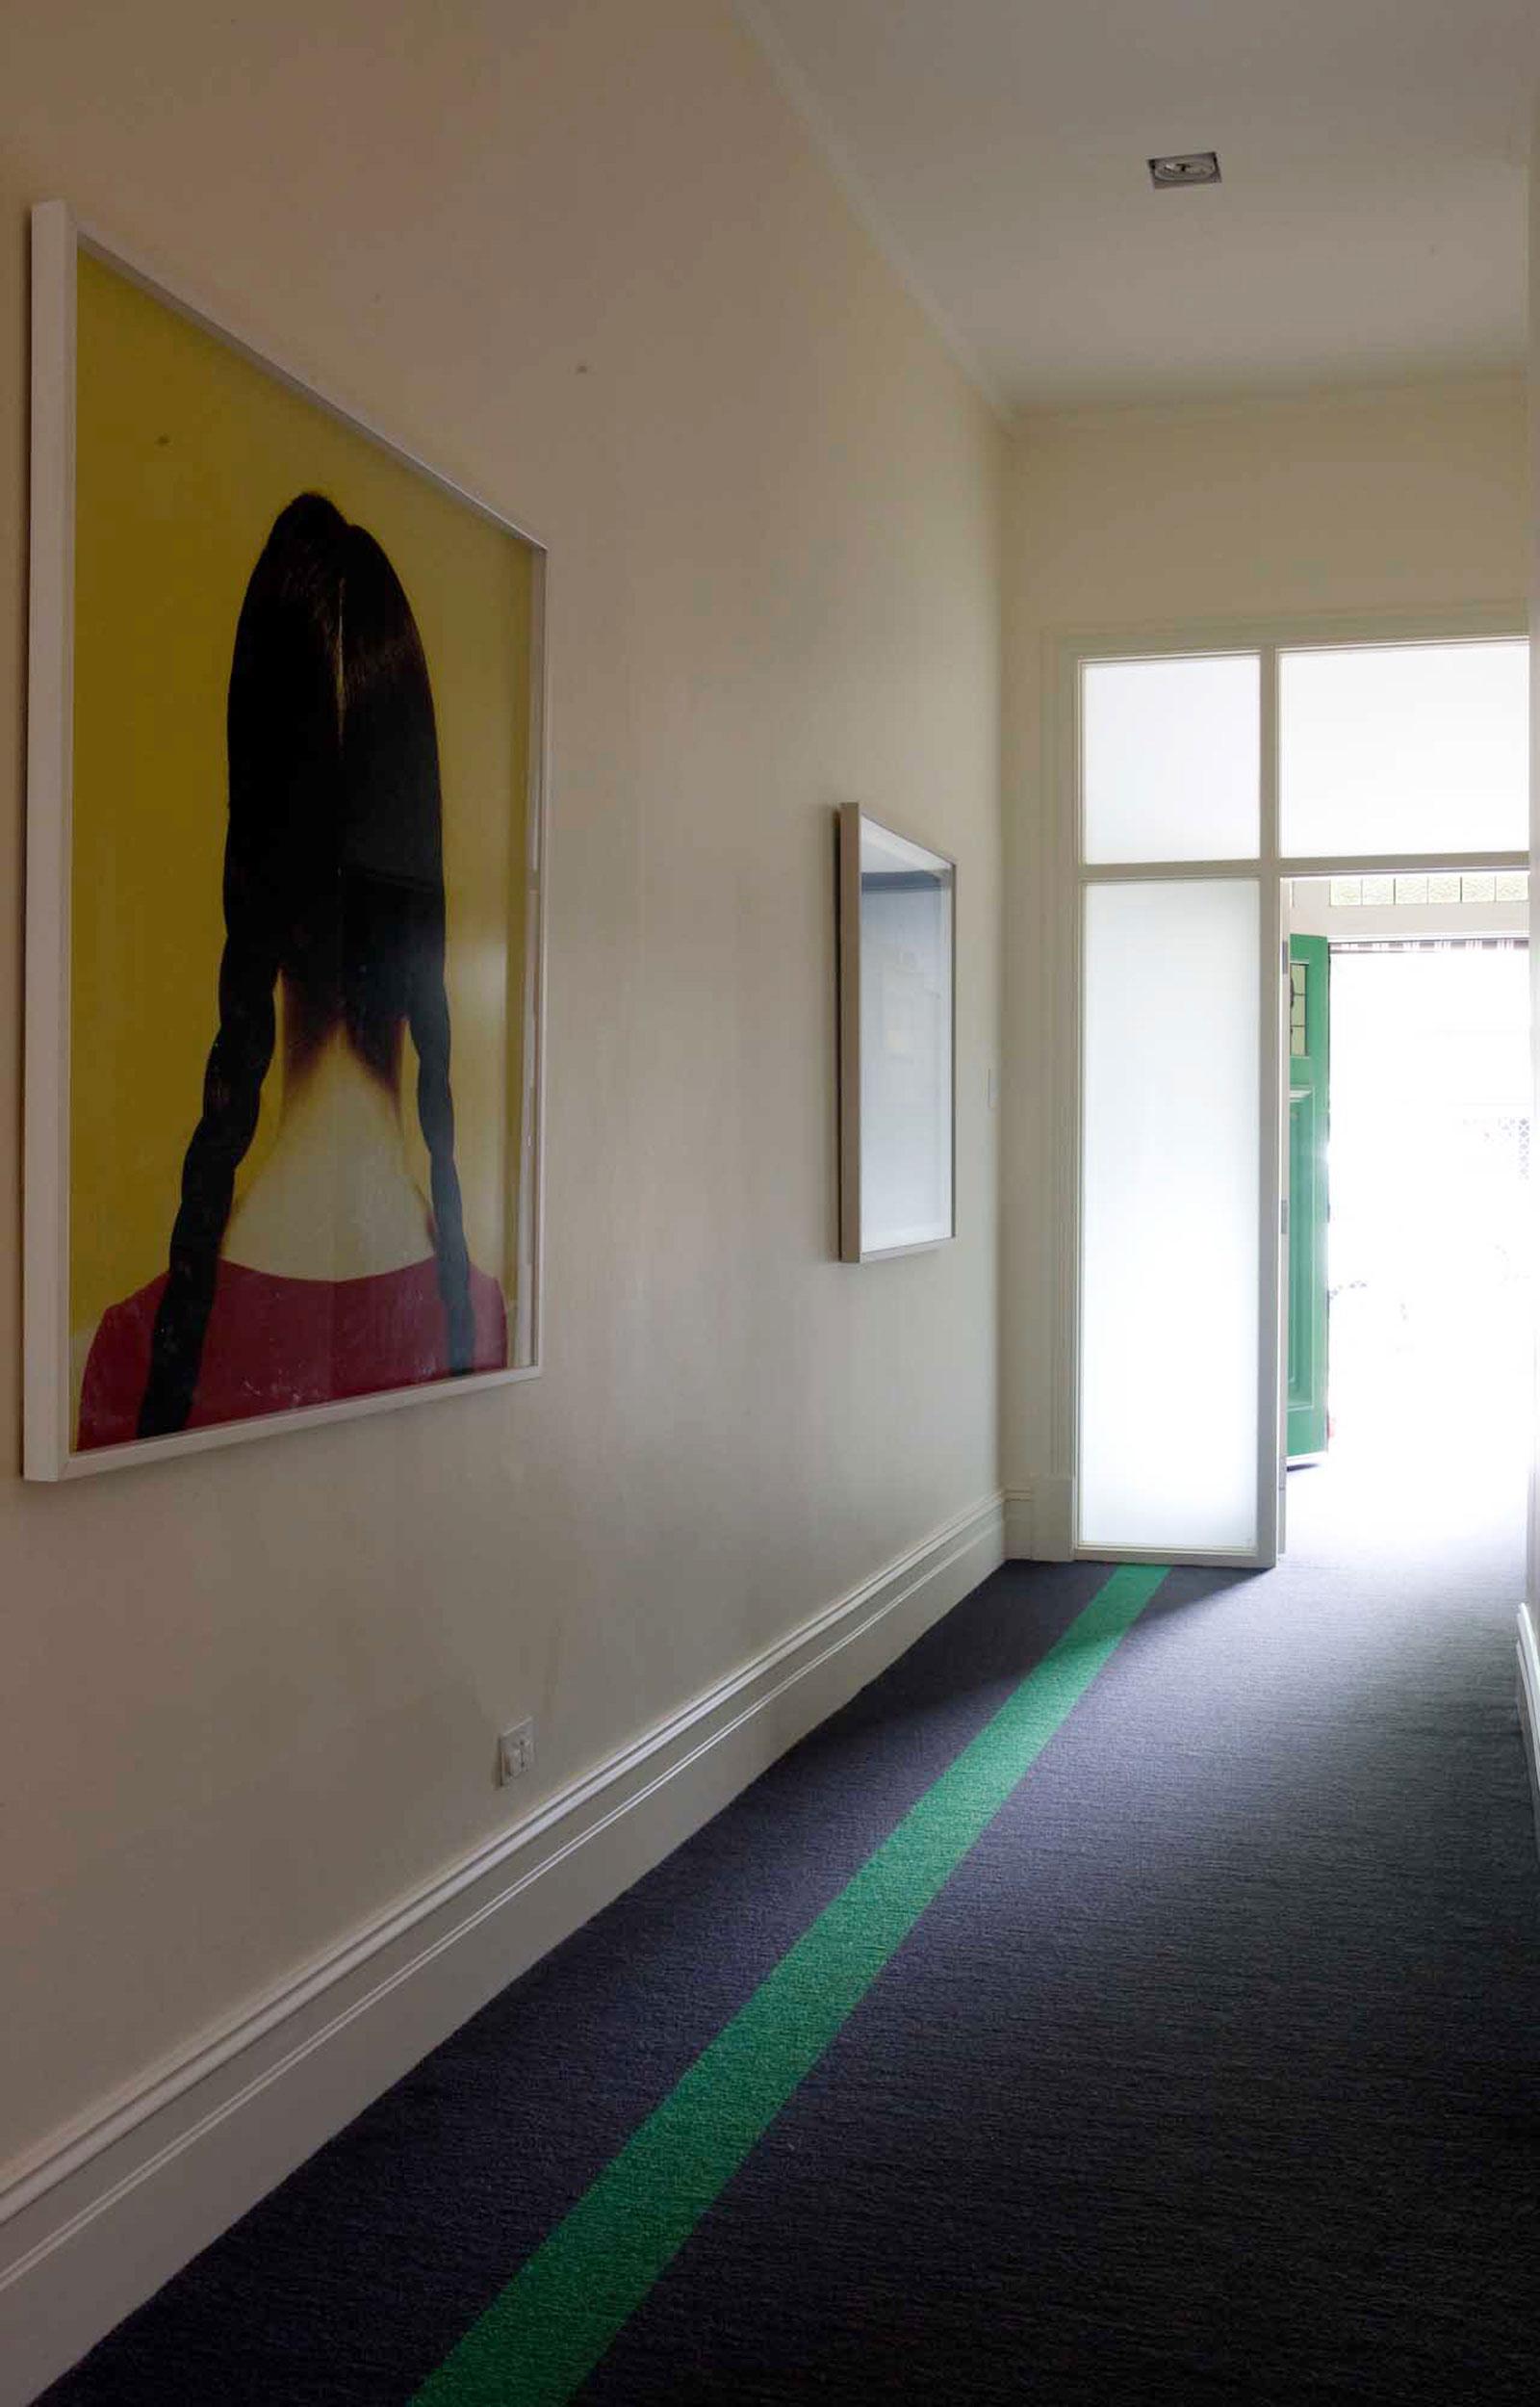 enoki-interior-Blair-4.jpg